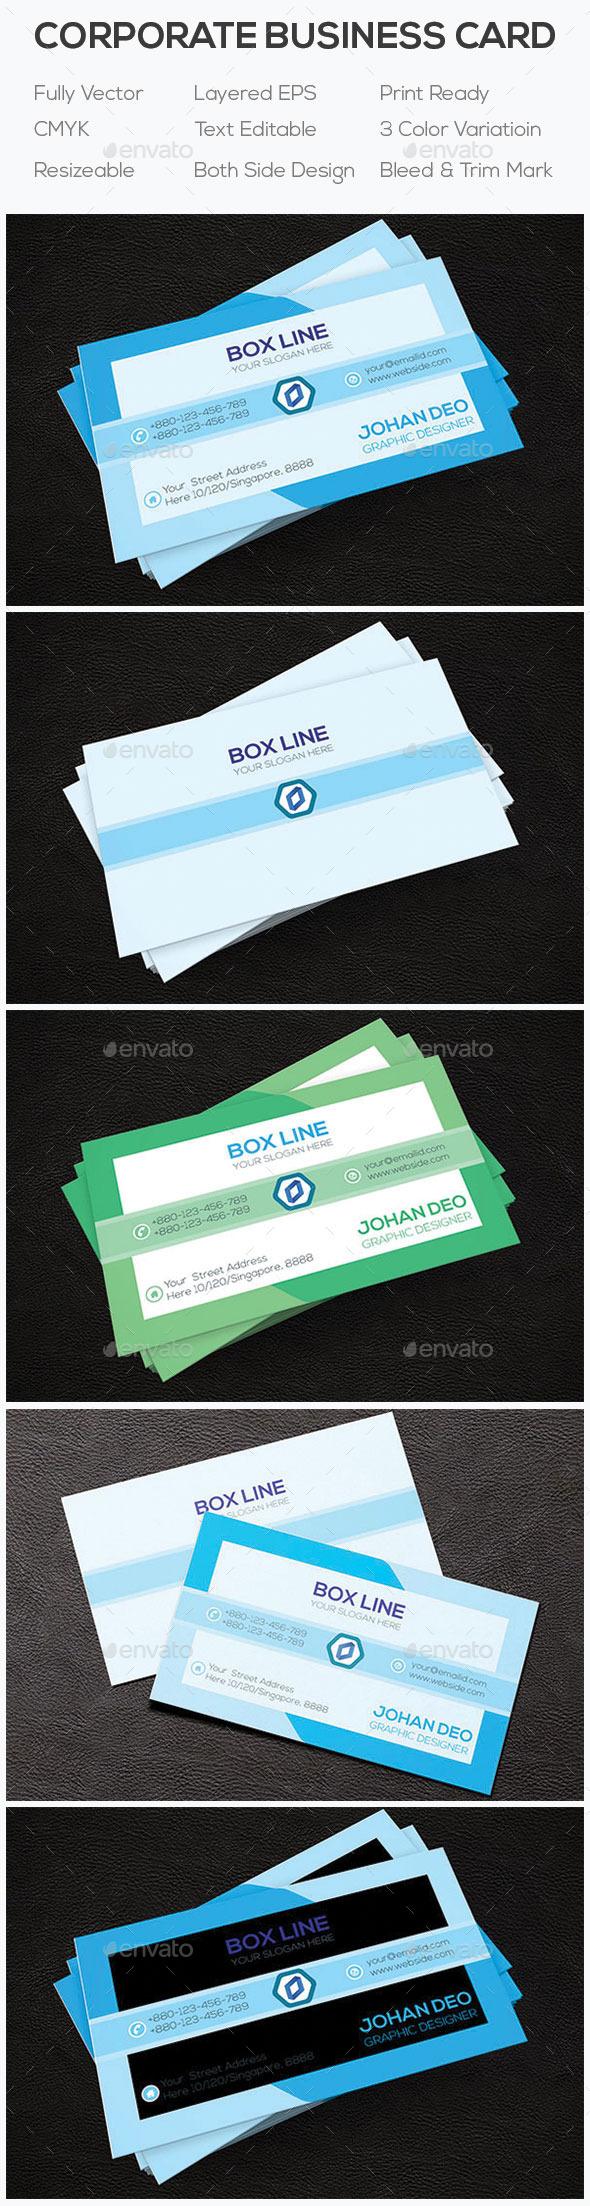 Corporate Business Card SDP-02 - Corporate Business Cards